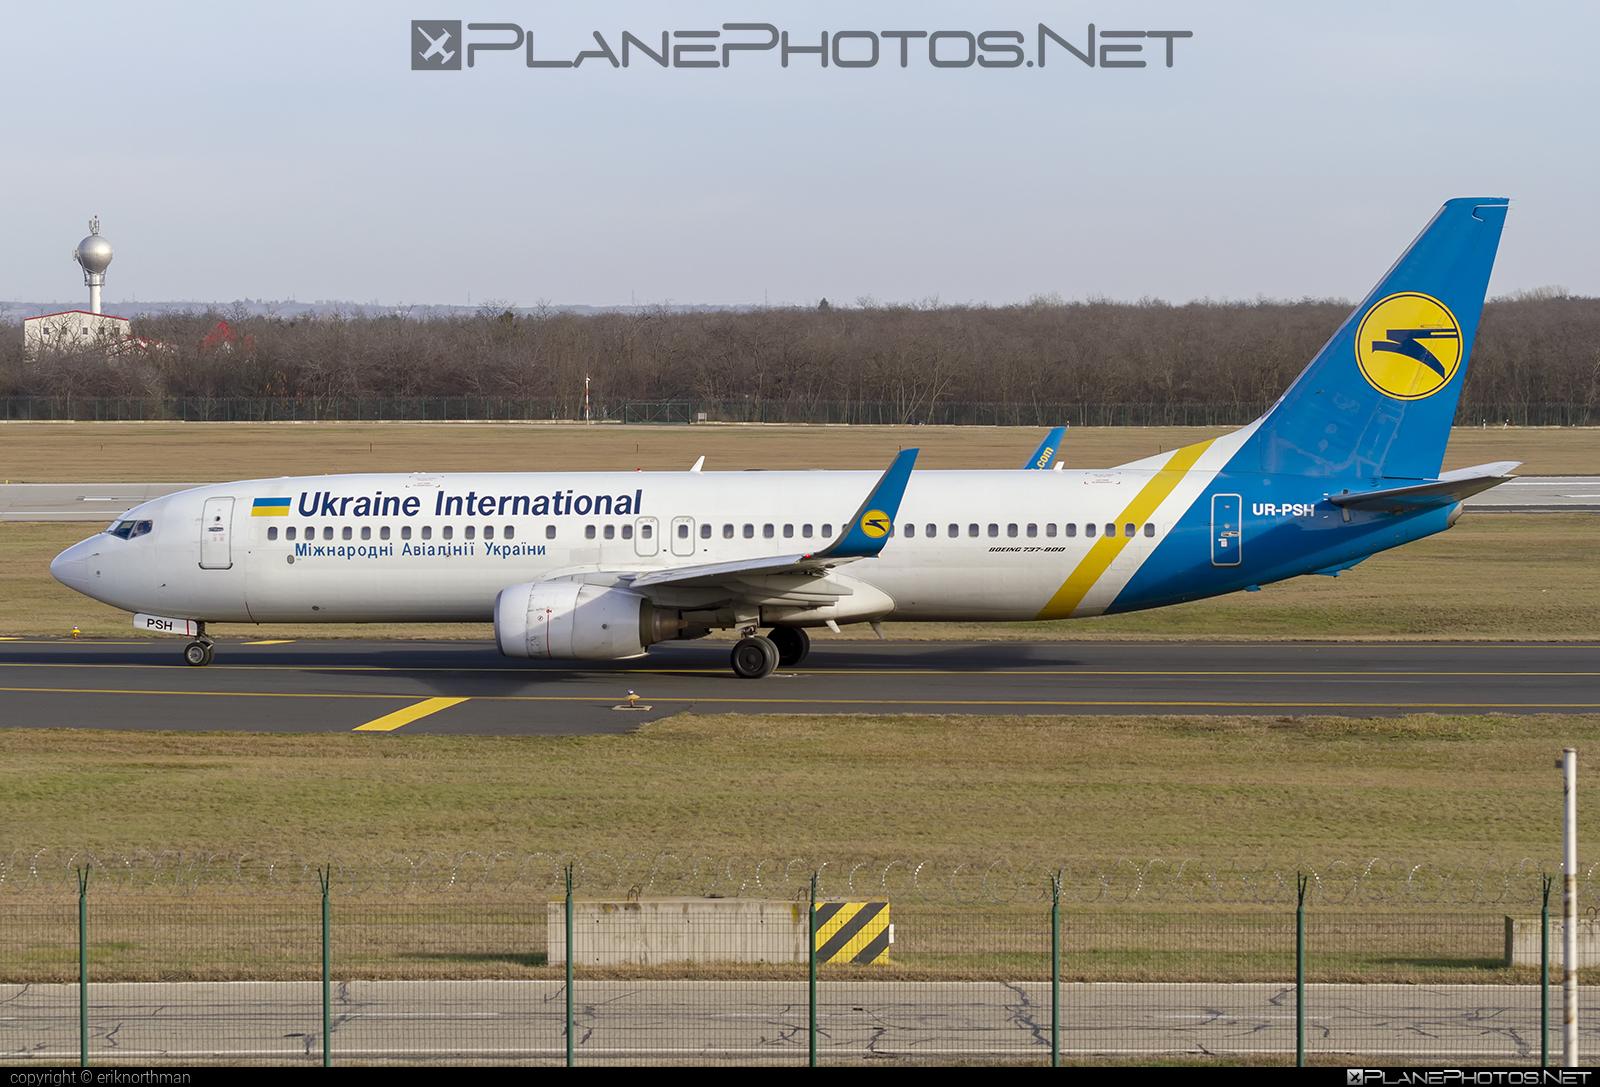 Boeing 737-800 - UR-PSH operated by Ukraine International Airlines #b737 #b737nextgen #b737ng #boeing #boeing737 #uia #ukraineinternationalairlines